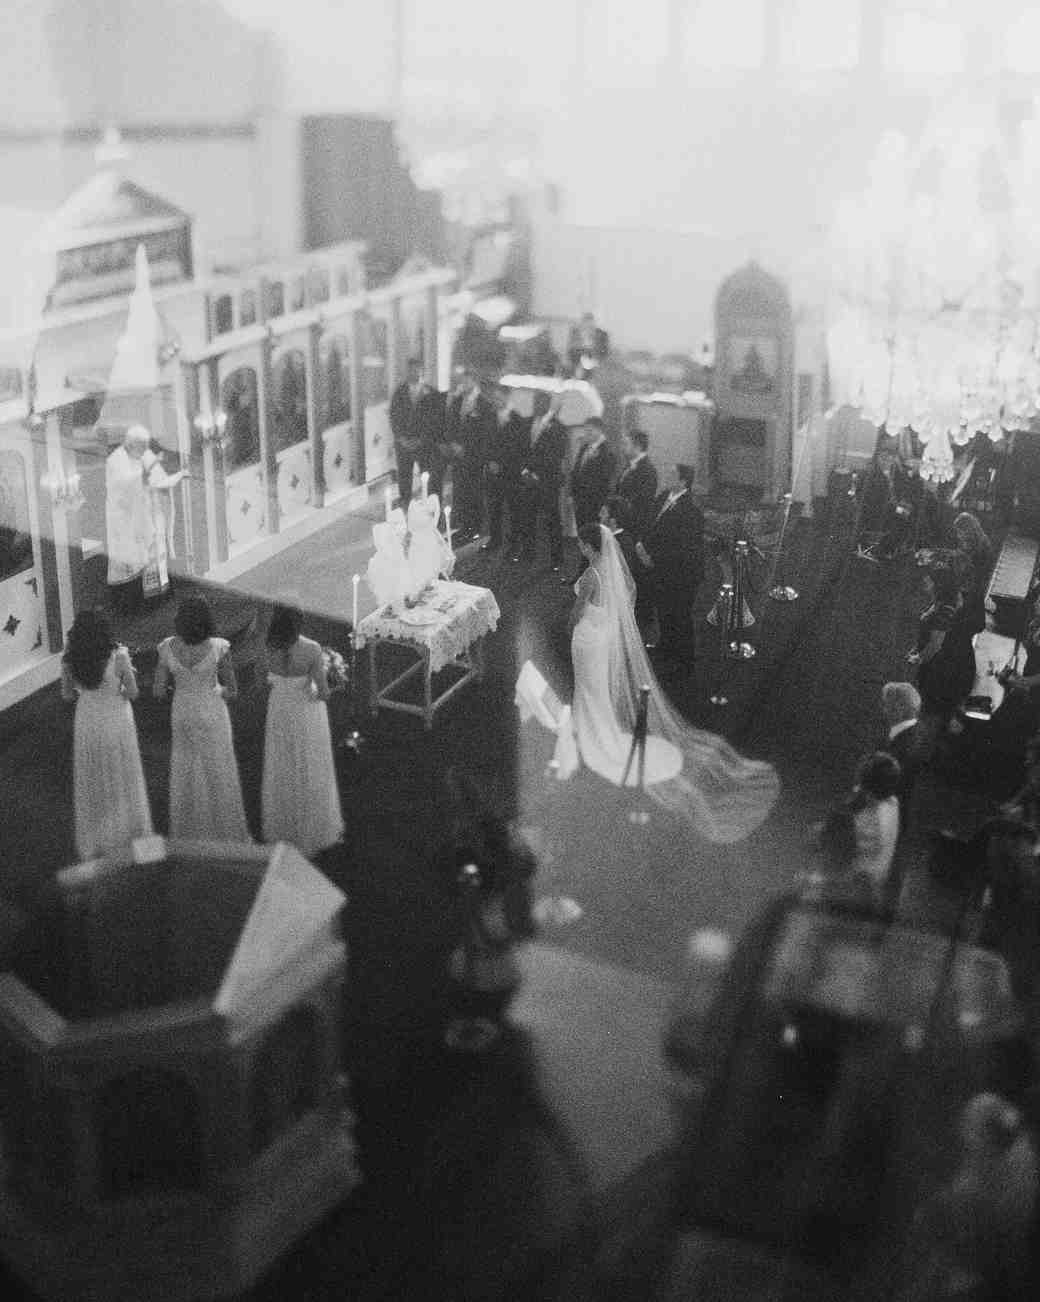 rosie-constantine-wedding-ceremony-155-s112177-1015.jpg